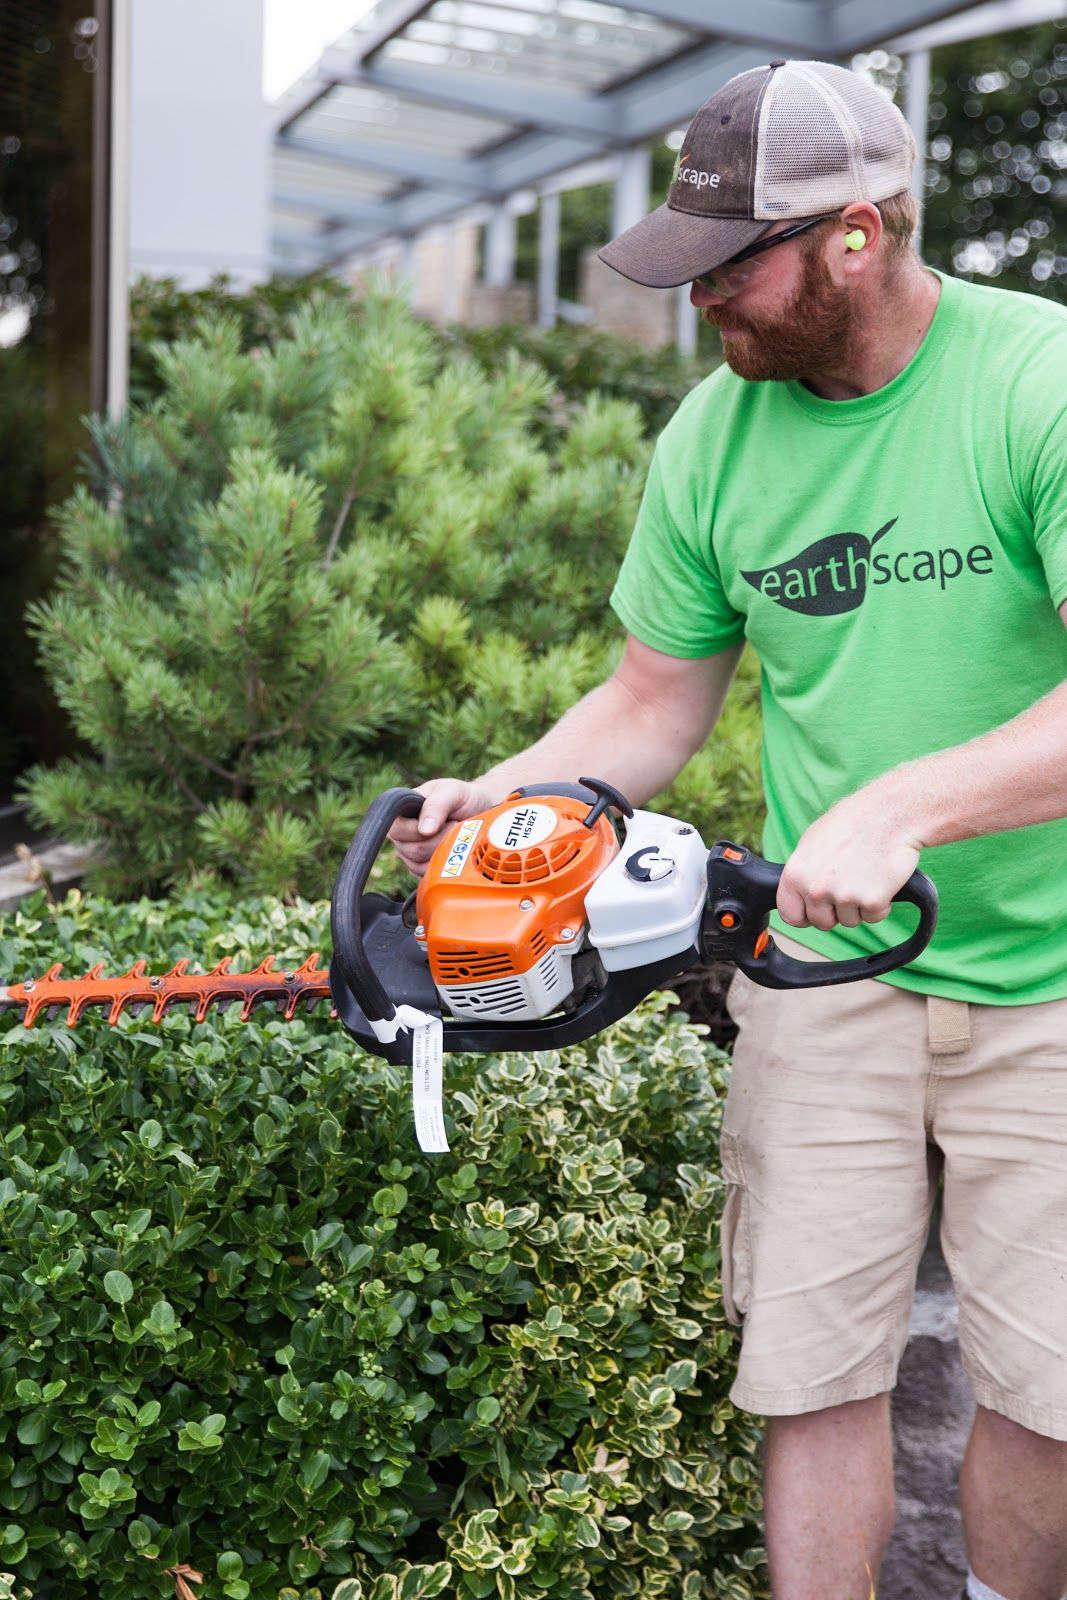 A landscaper trimming the bushes.